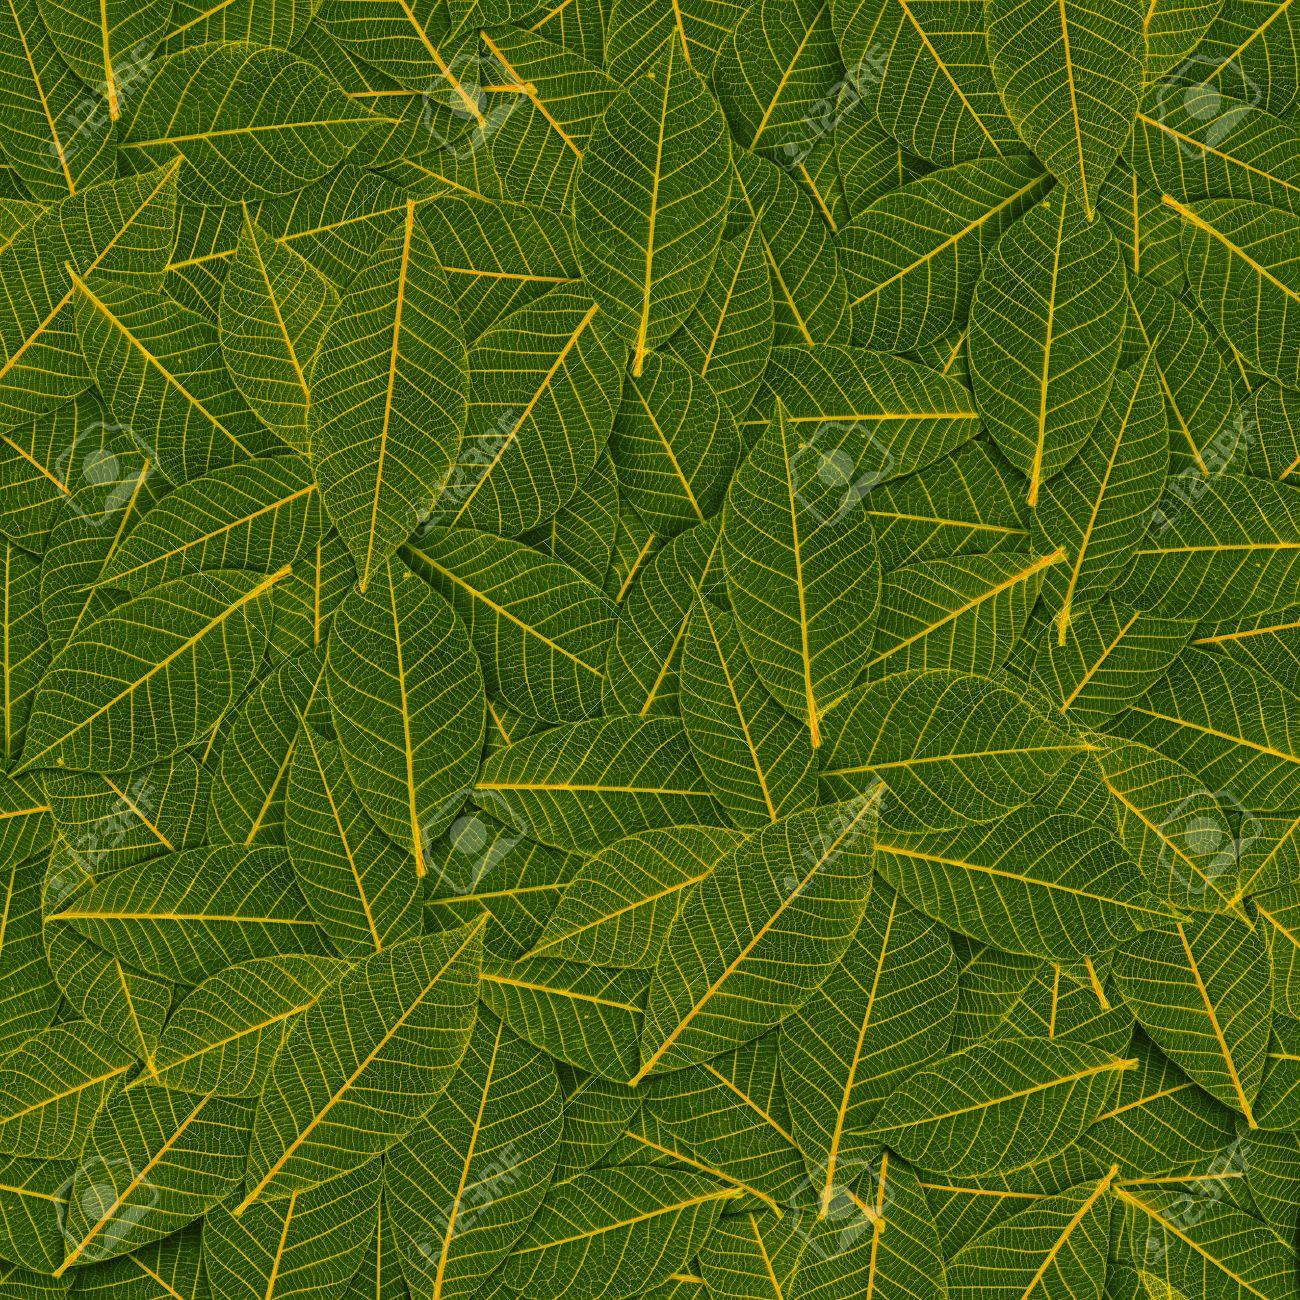 yellow green transparent leaf pattern Stock Photo - 16241122